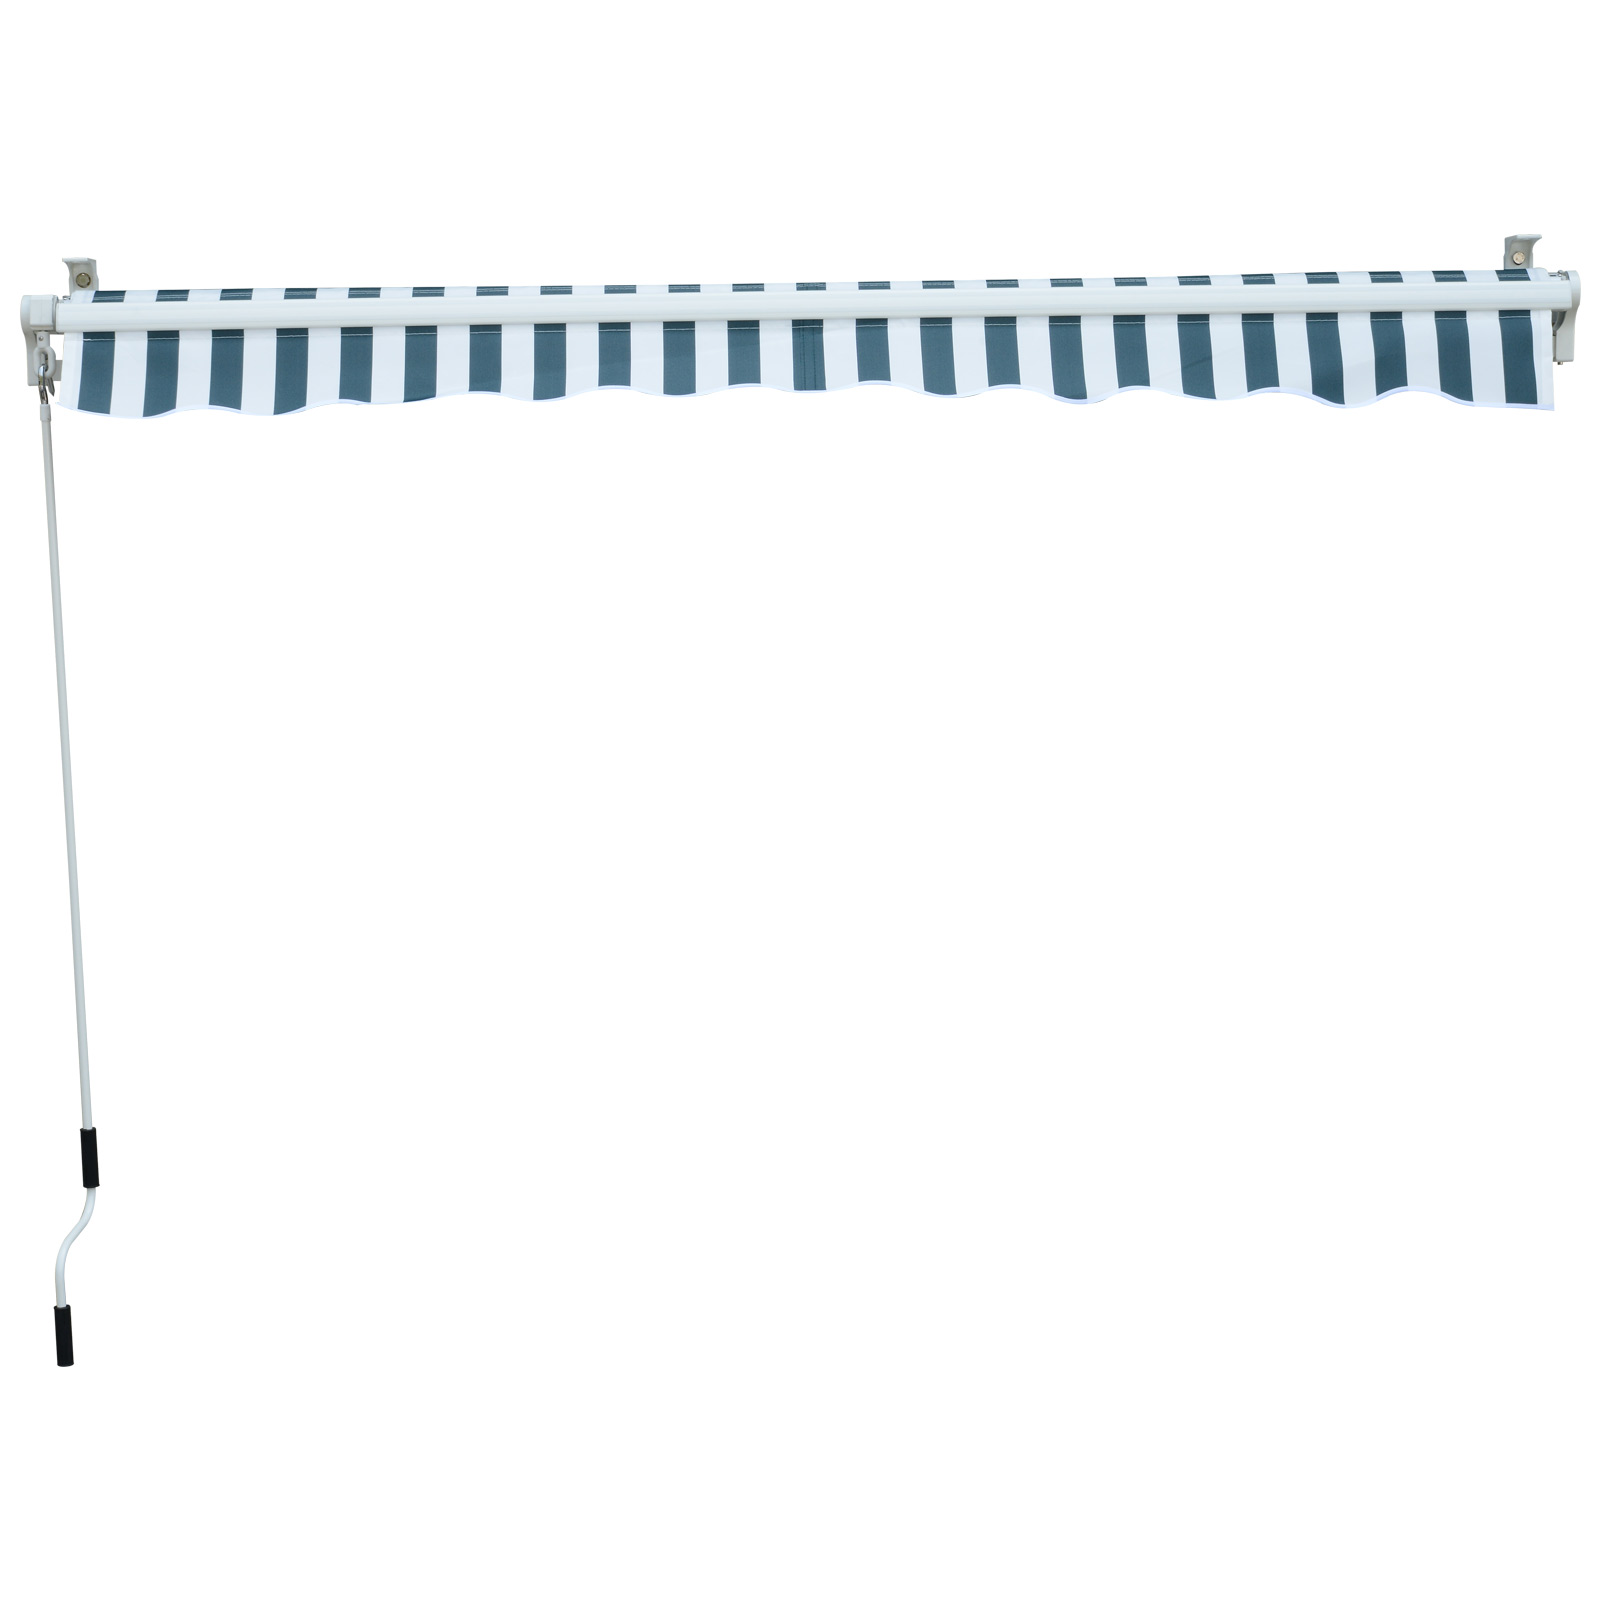 Garden-Patio-Manual-Awning-Canopy-Sun-Shade-Shelter-Retractable-4-Size-5-Colour thumbnail 23